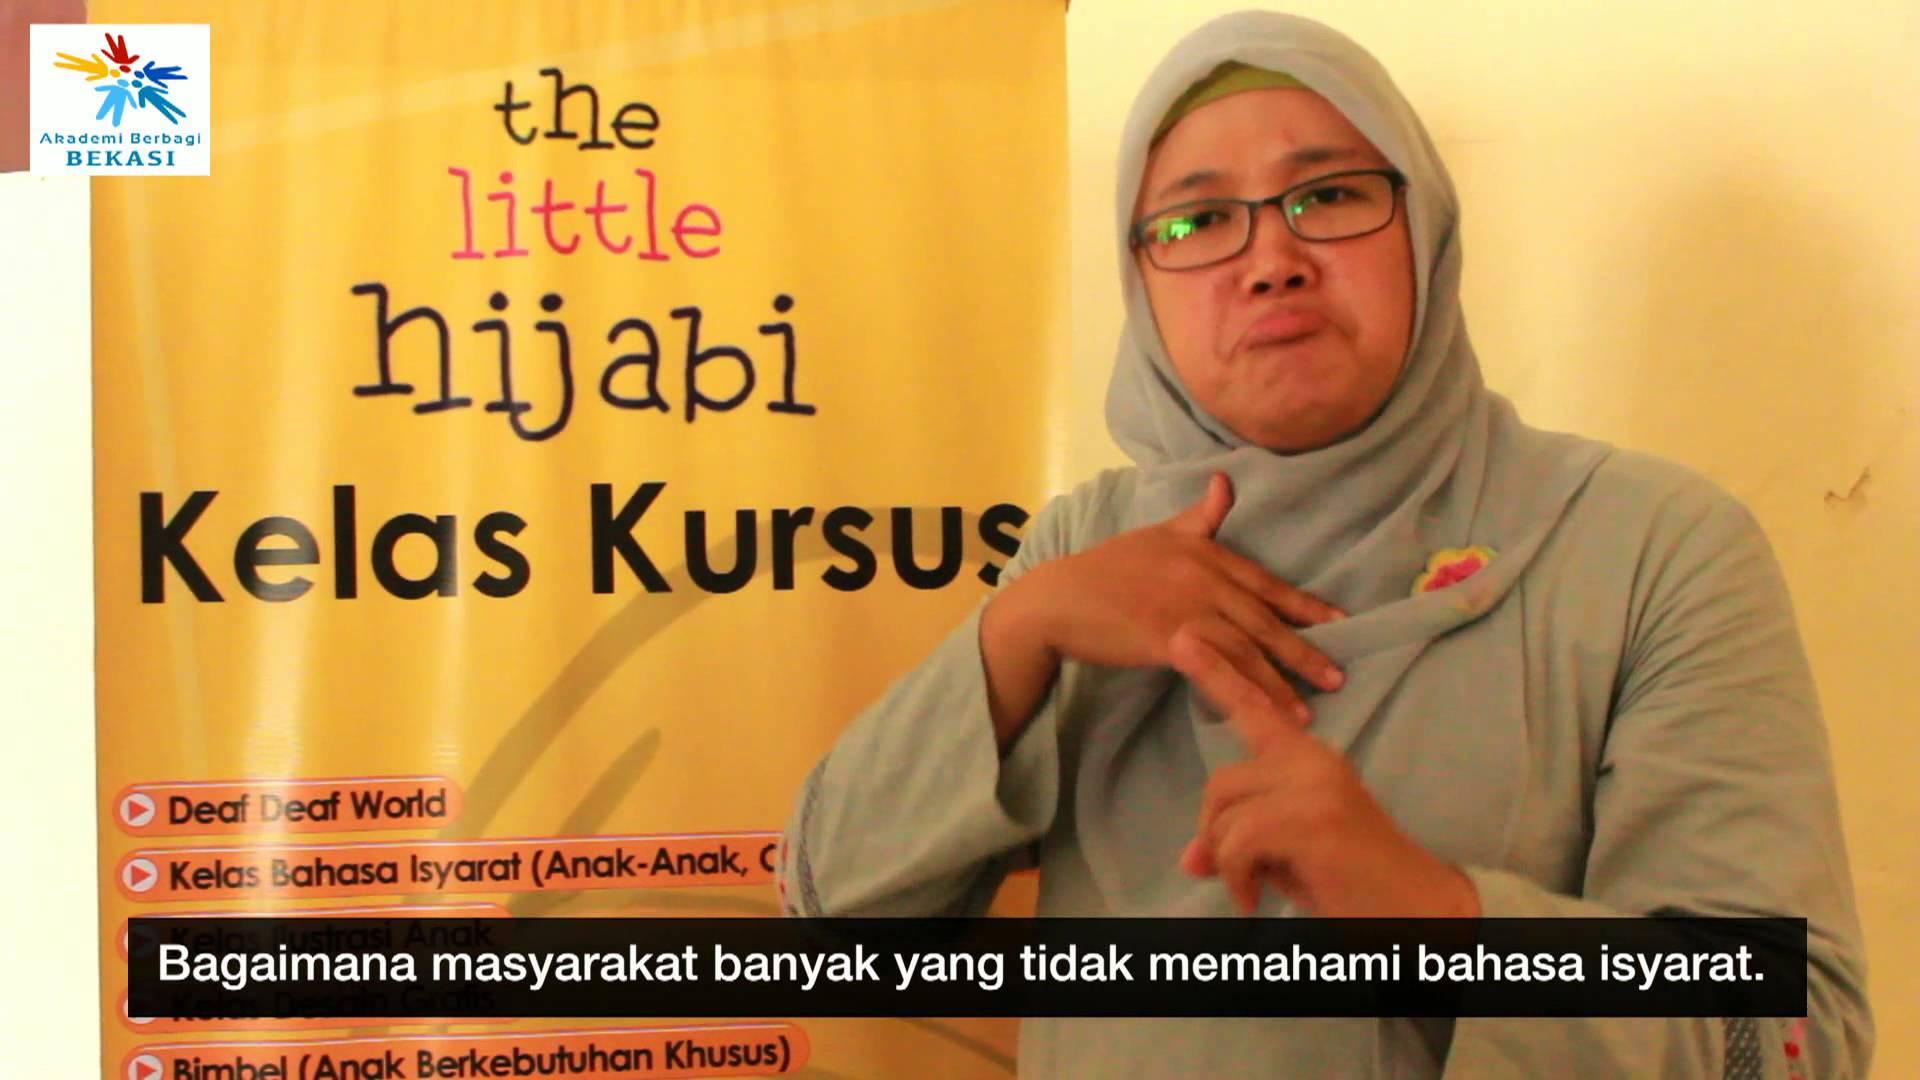 Akber Bekasi: Riuh di tengah Sunyi